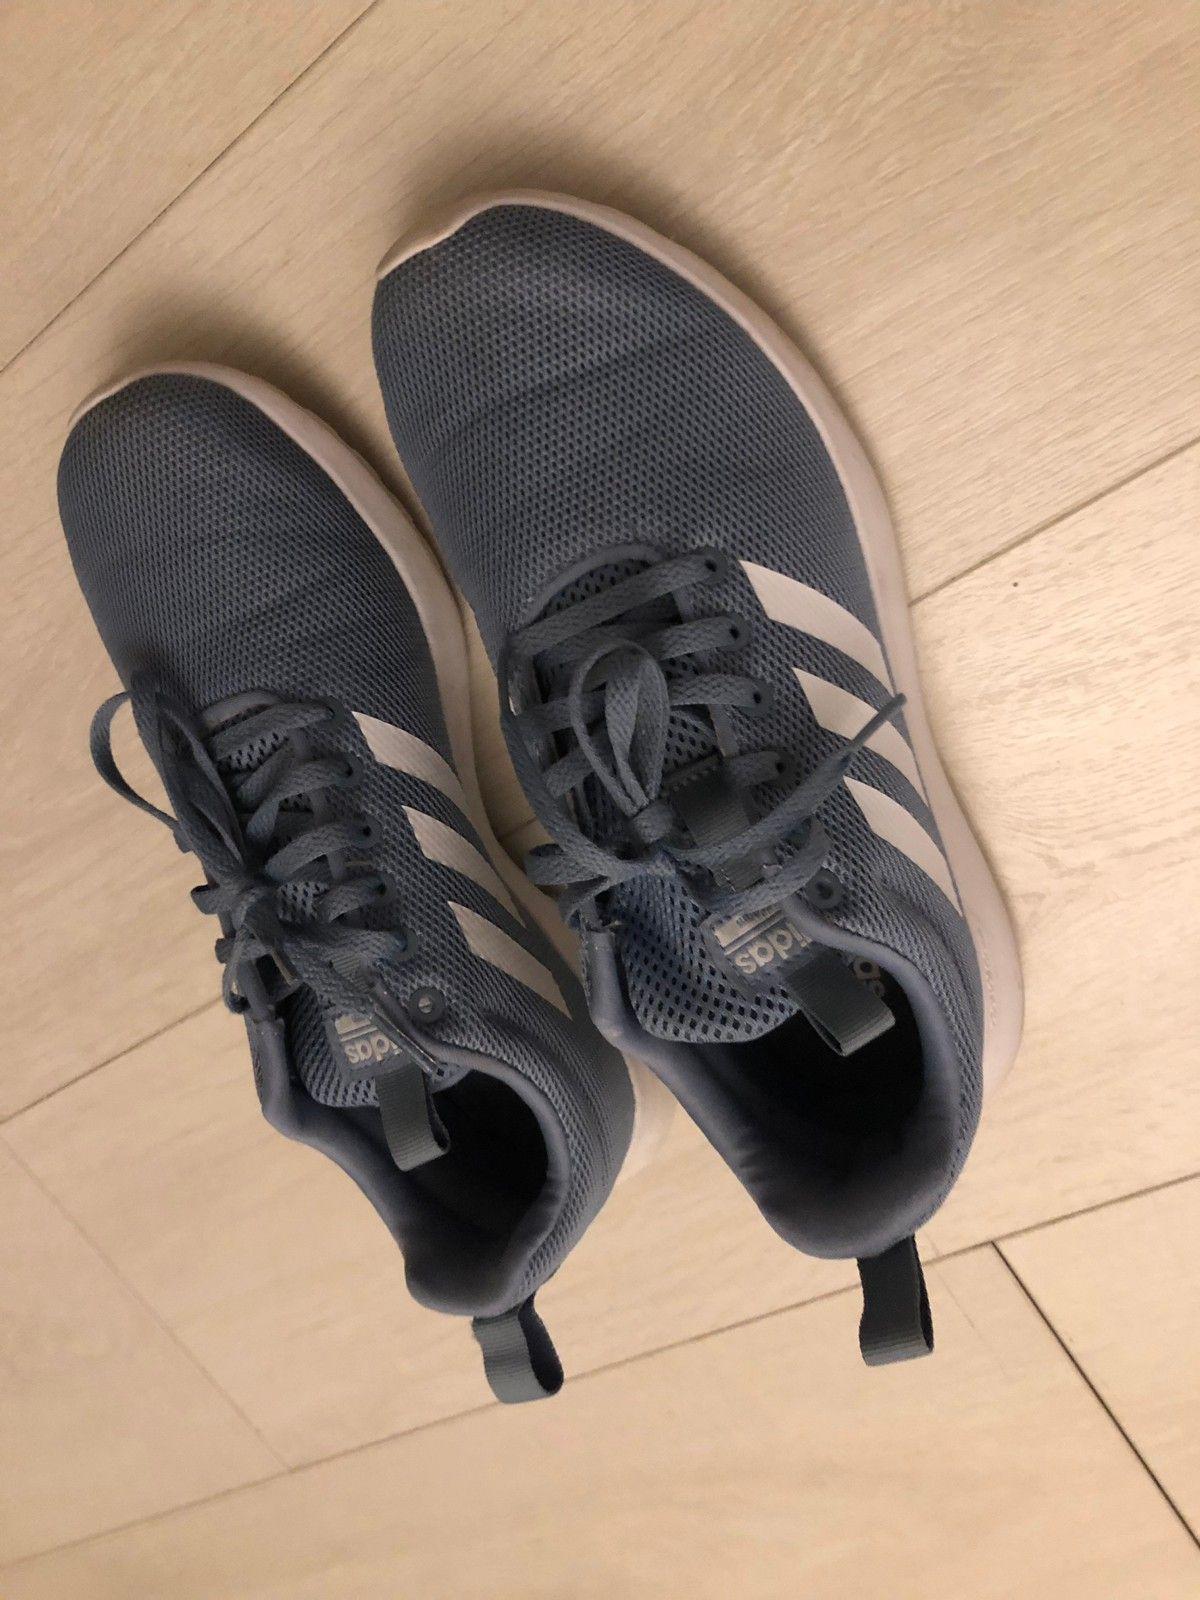 Adidas sko størelse 39